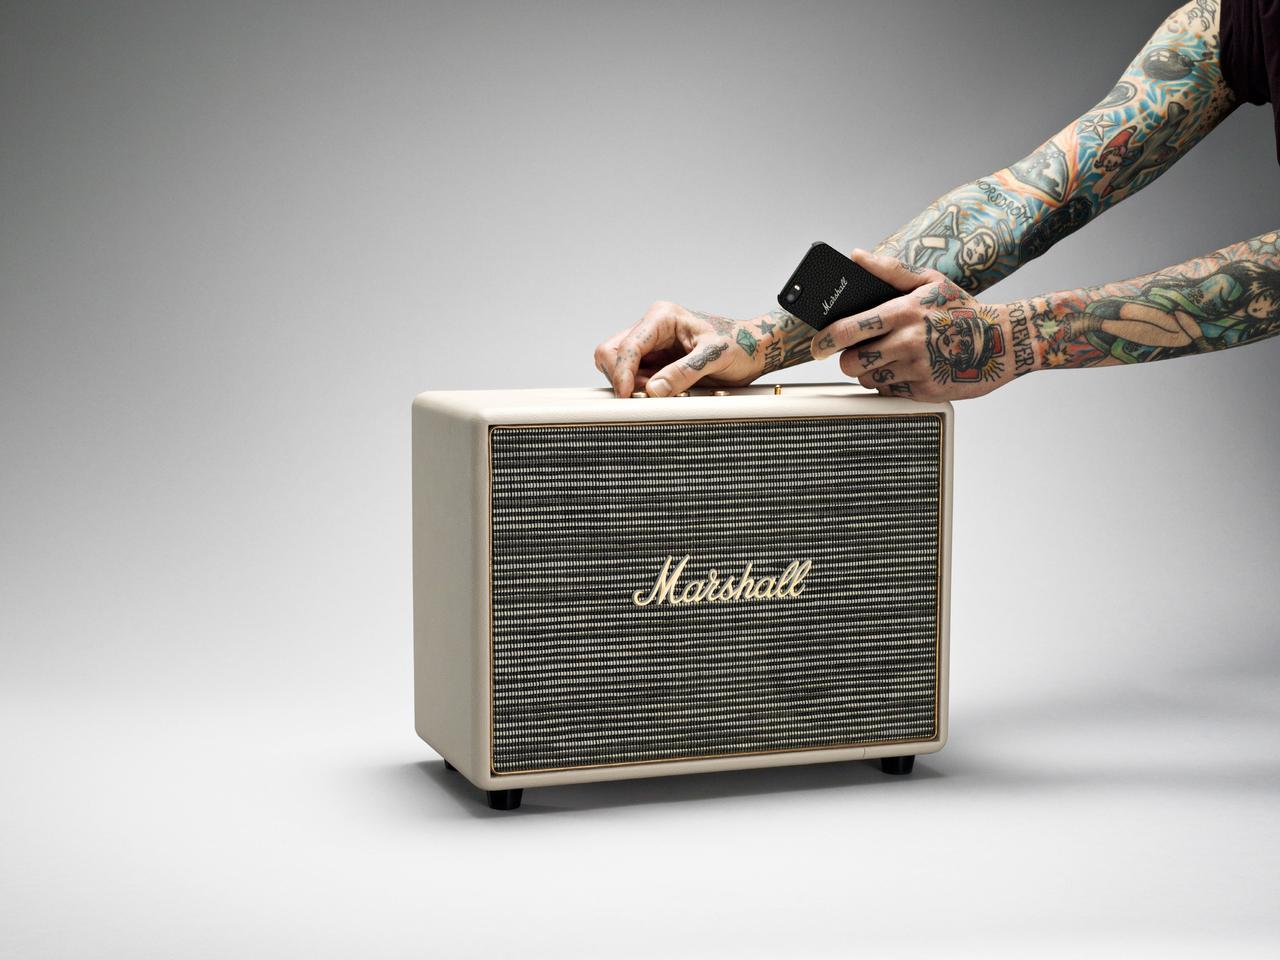 The Marshall Woburn streaming speaker system